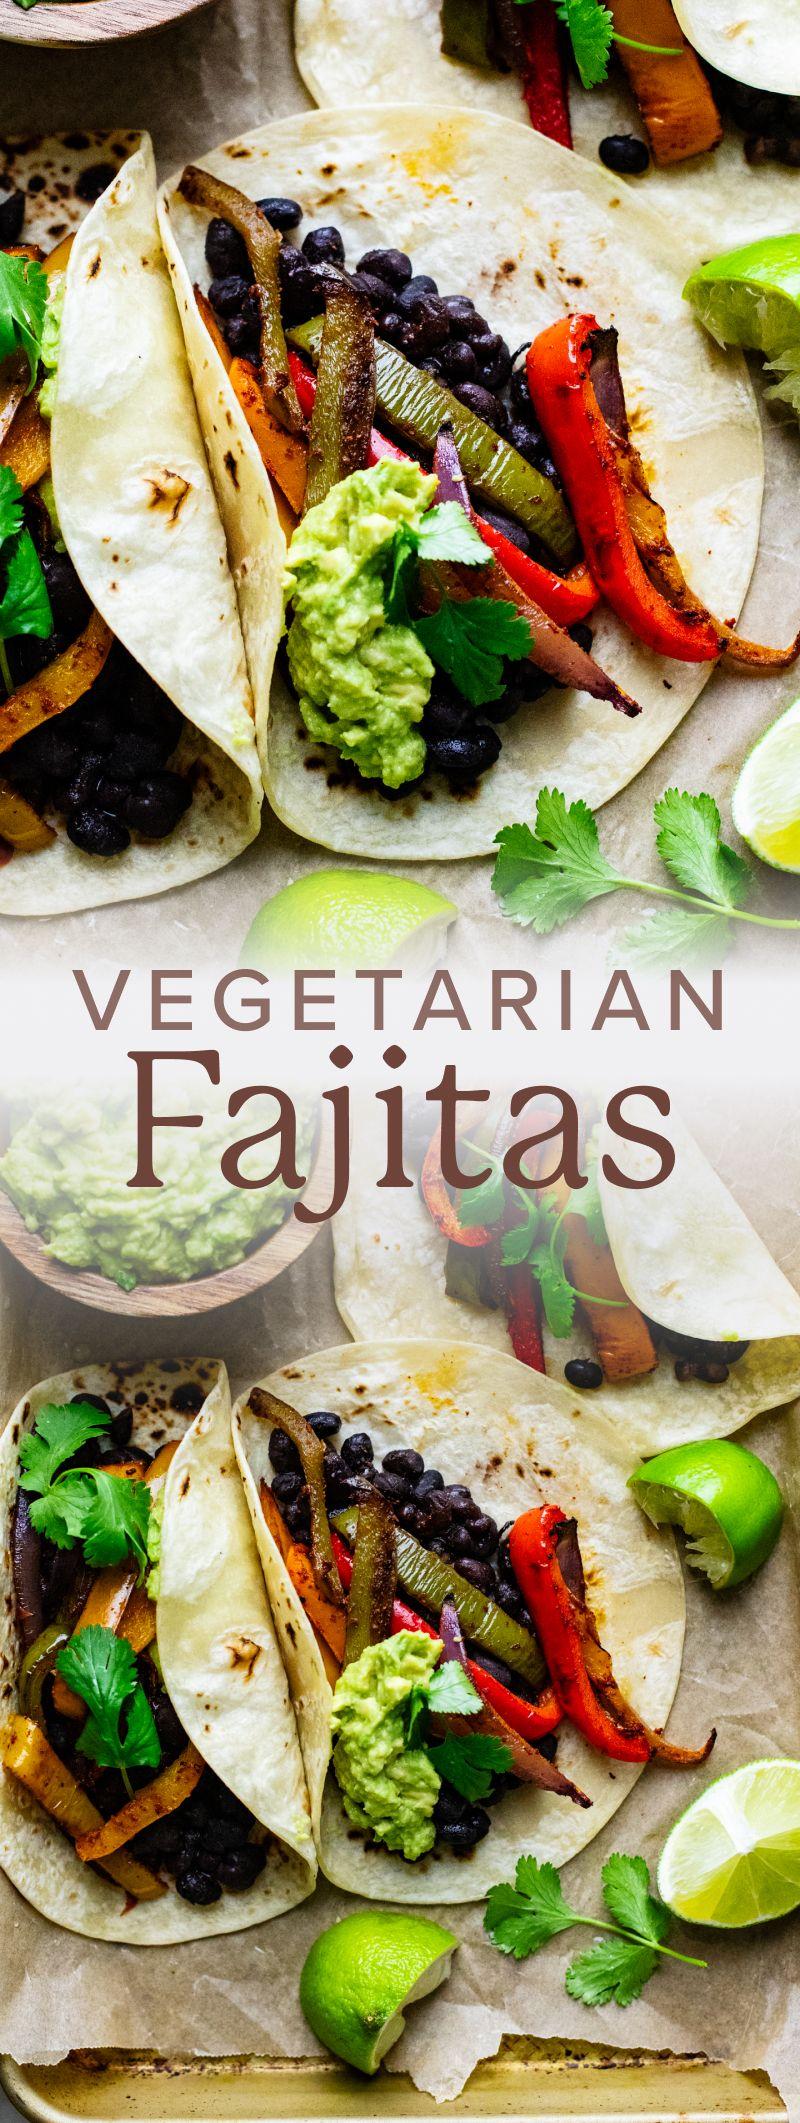 The Best Ever Vegetarian Fajitas A Simple Palate Recipe In 2021 Vegetarian Fajitas Plant Based Recipes Dinner Vegetarian Fajita Recipes